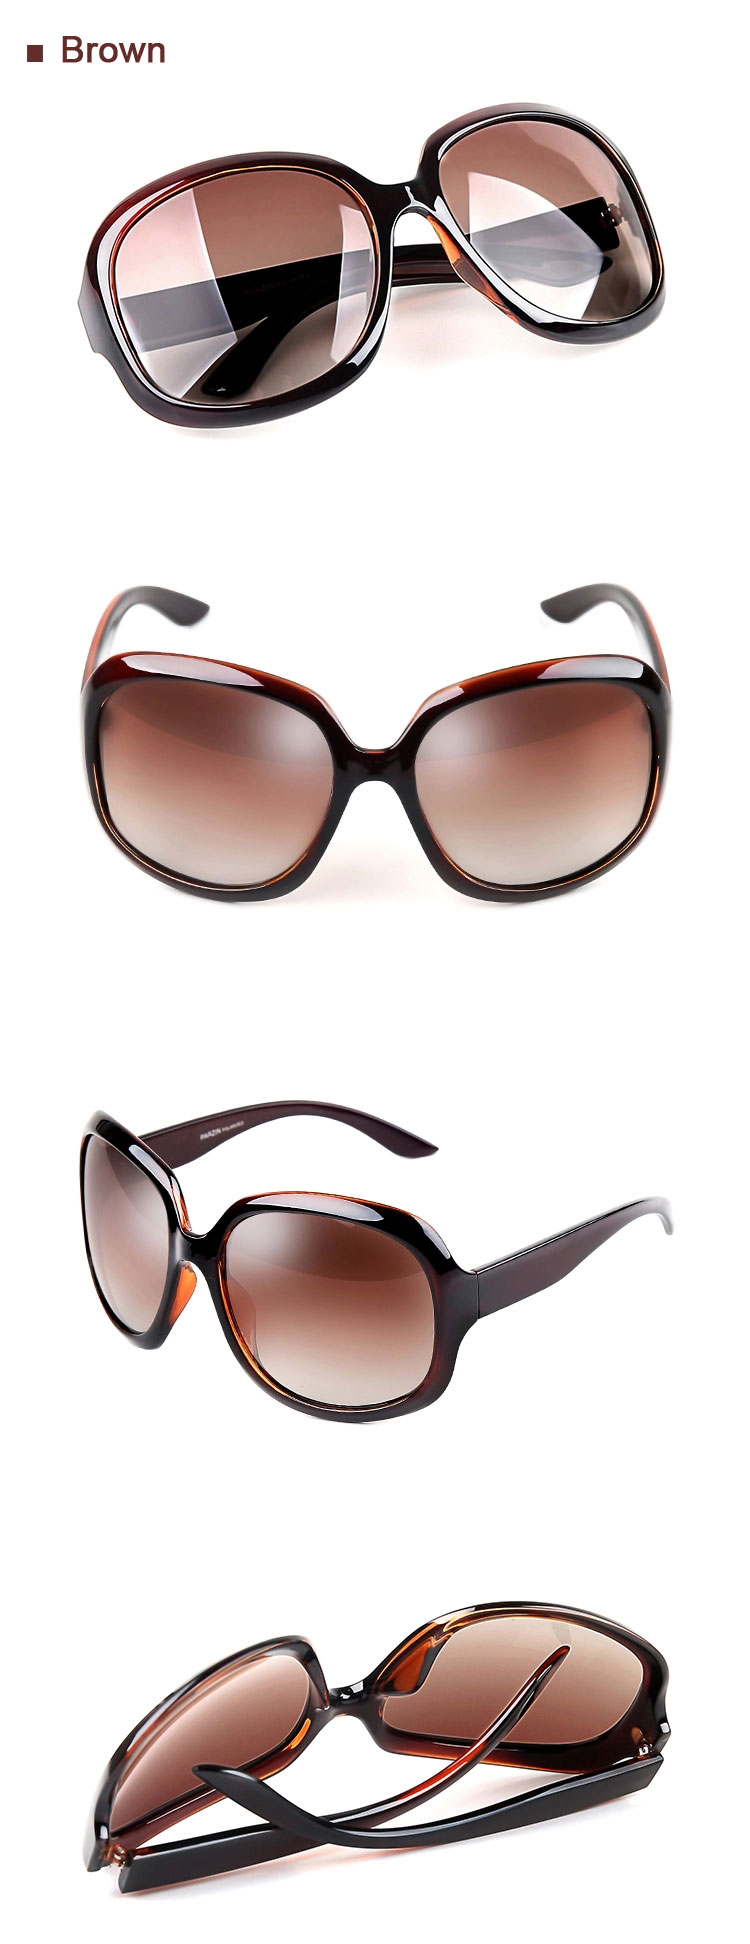 Brown Retro Oversized Sunglasses